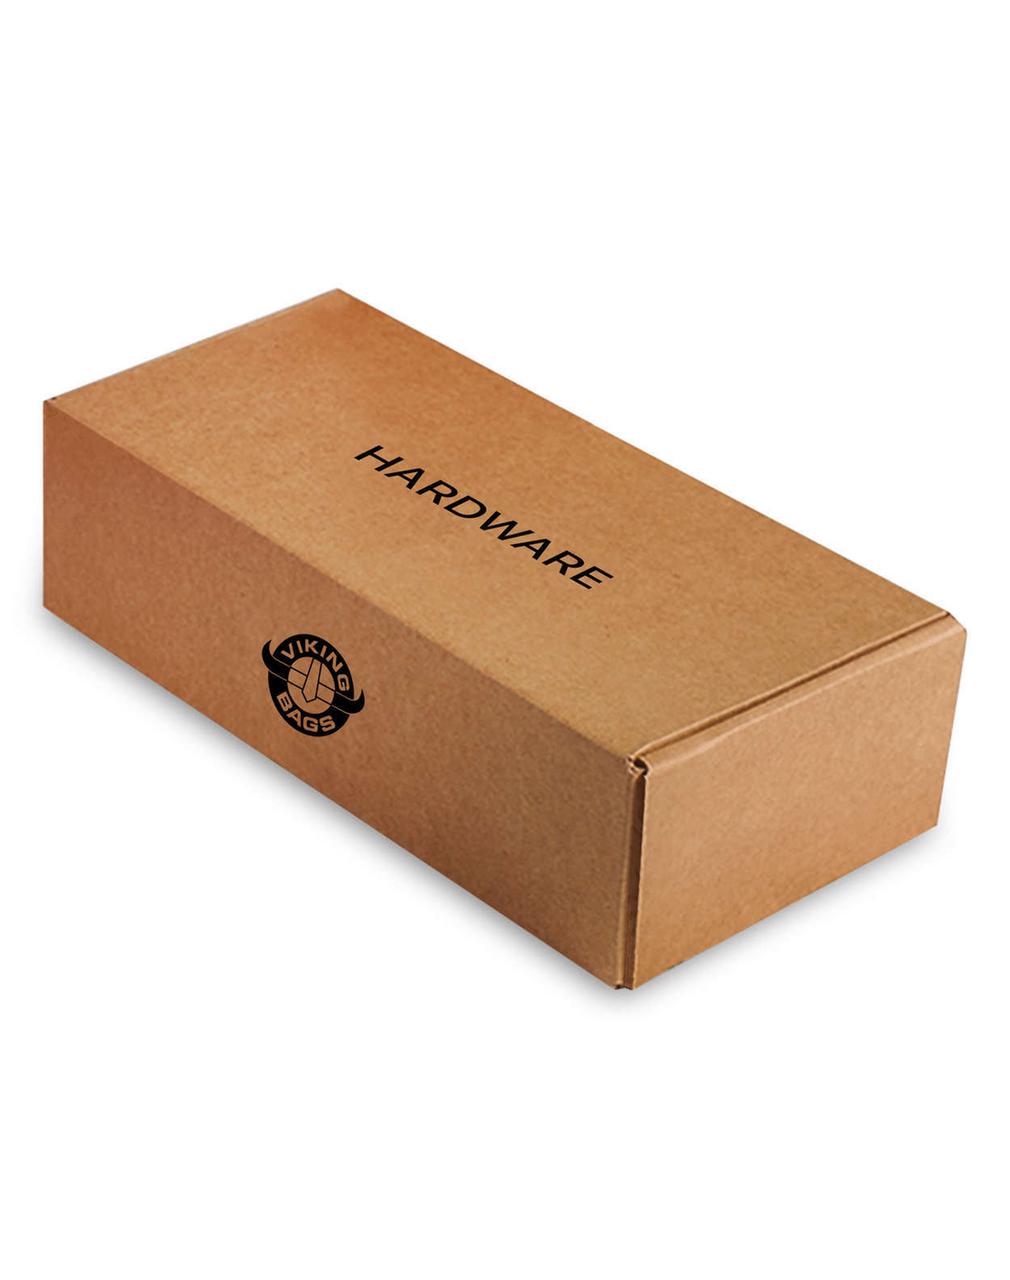 Honda 750 Shadow Phantom Medium SS Slanted Studded Motorcycle Saddlebags box